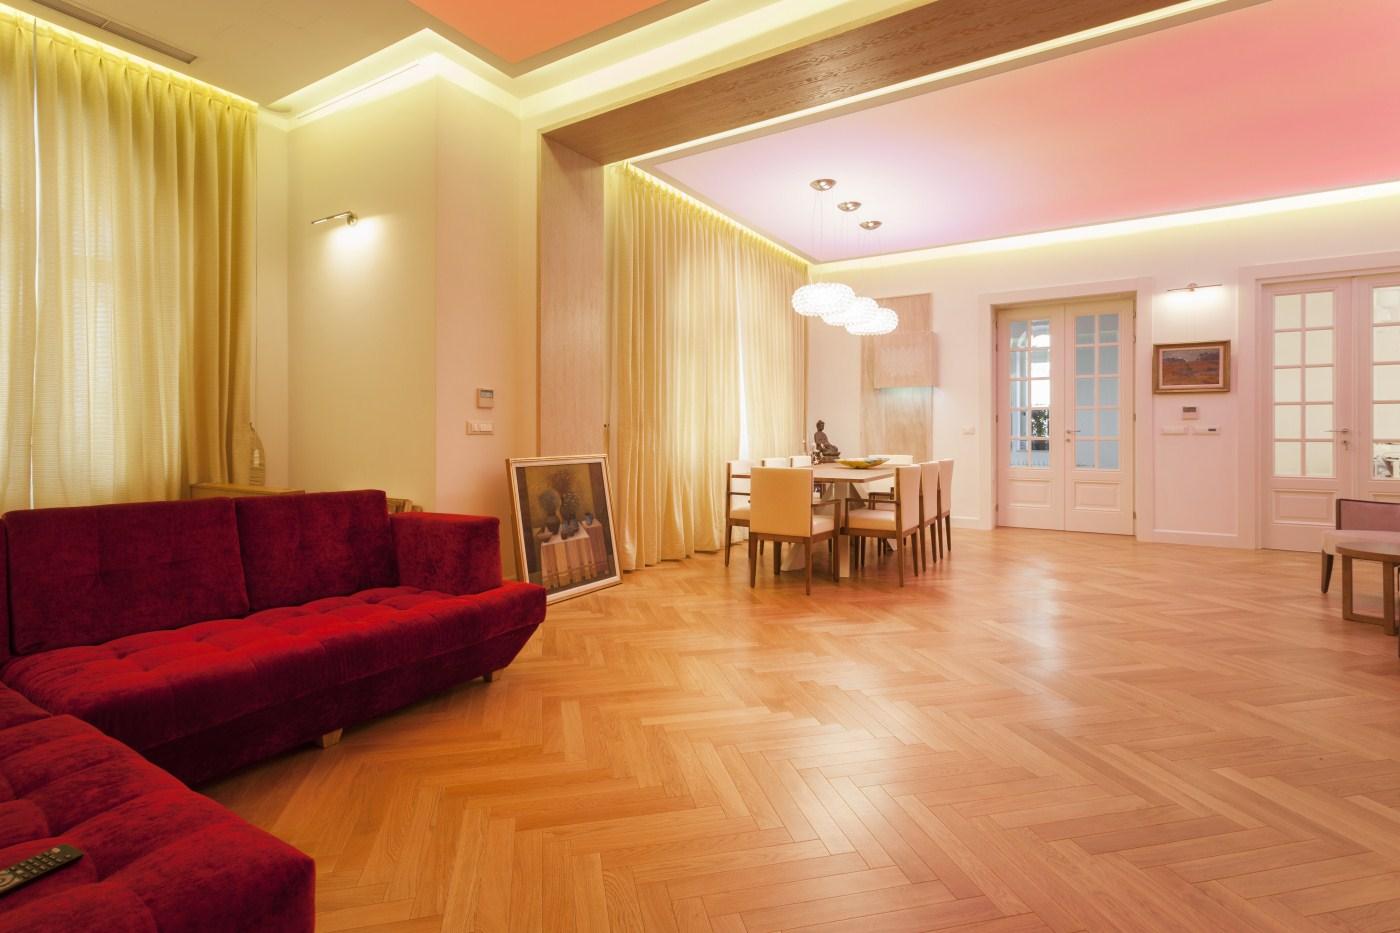 https://nbc-arhitect.ro/wp-content/uploads/2020/10/NBC-Arhitect-_-restorations-_-Washington-House-_-Bucharest-Romania_9.jpg